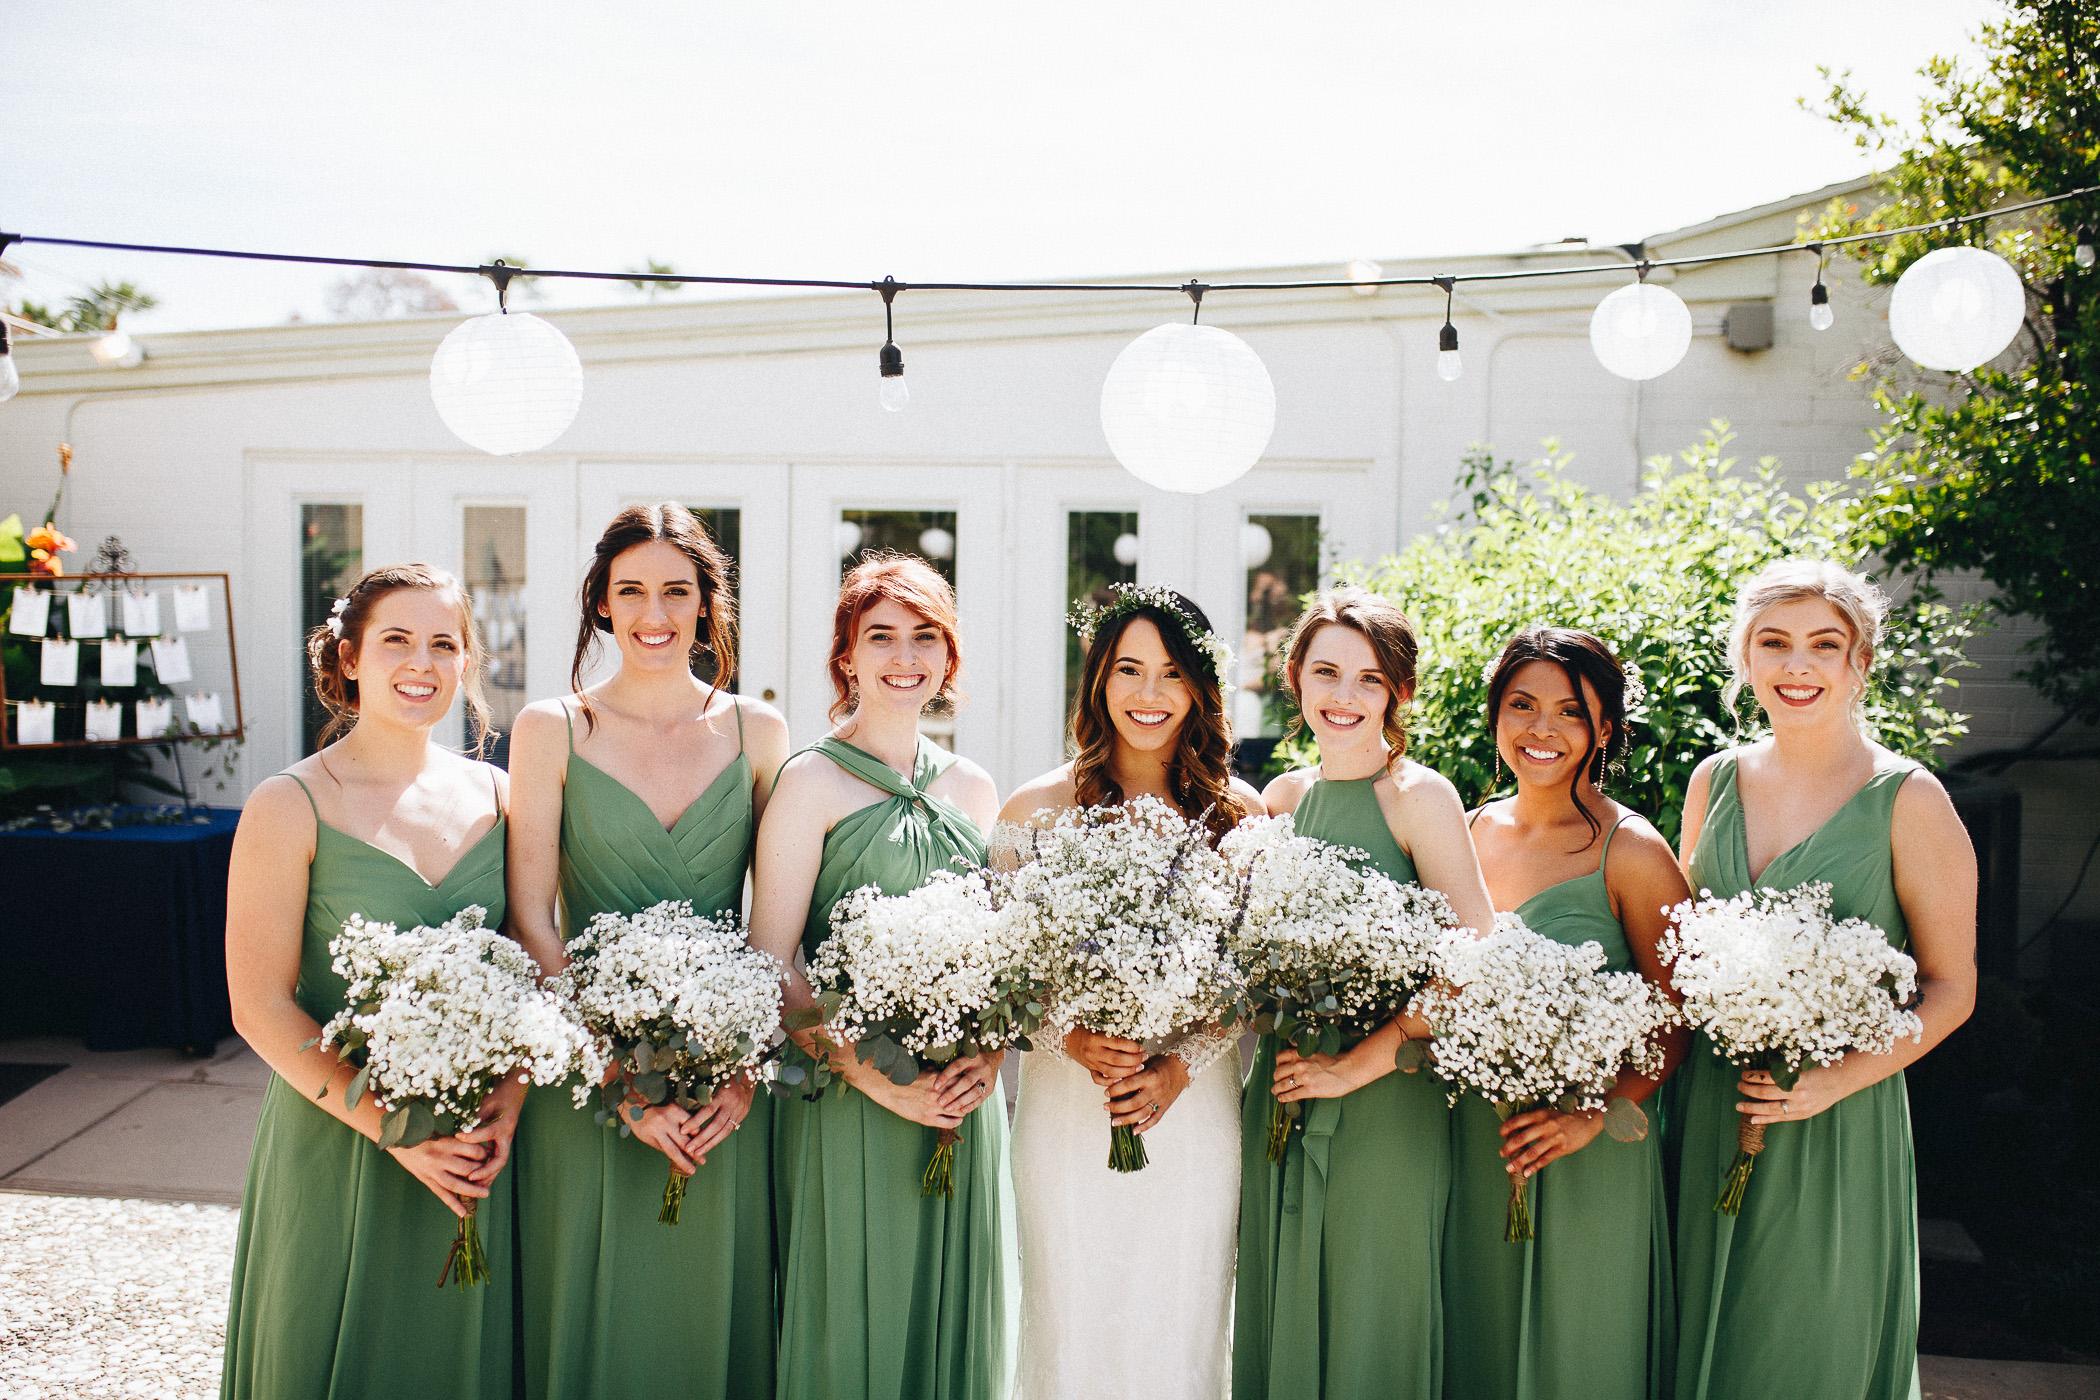 181104-Luxium-Weddings-Arizona-@matt__Le-Brandon-Kariana-Phoenix-Valley-Garden-Center-1010a.jpg